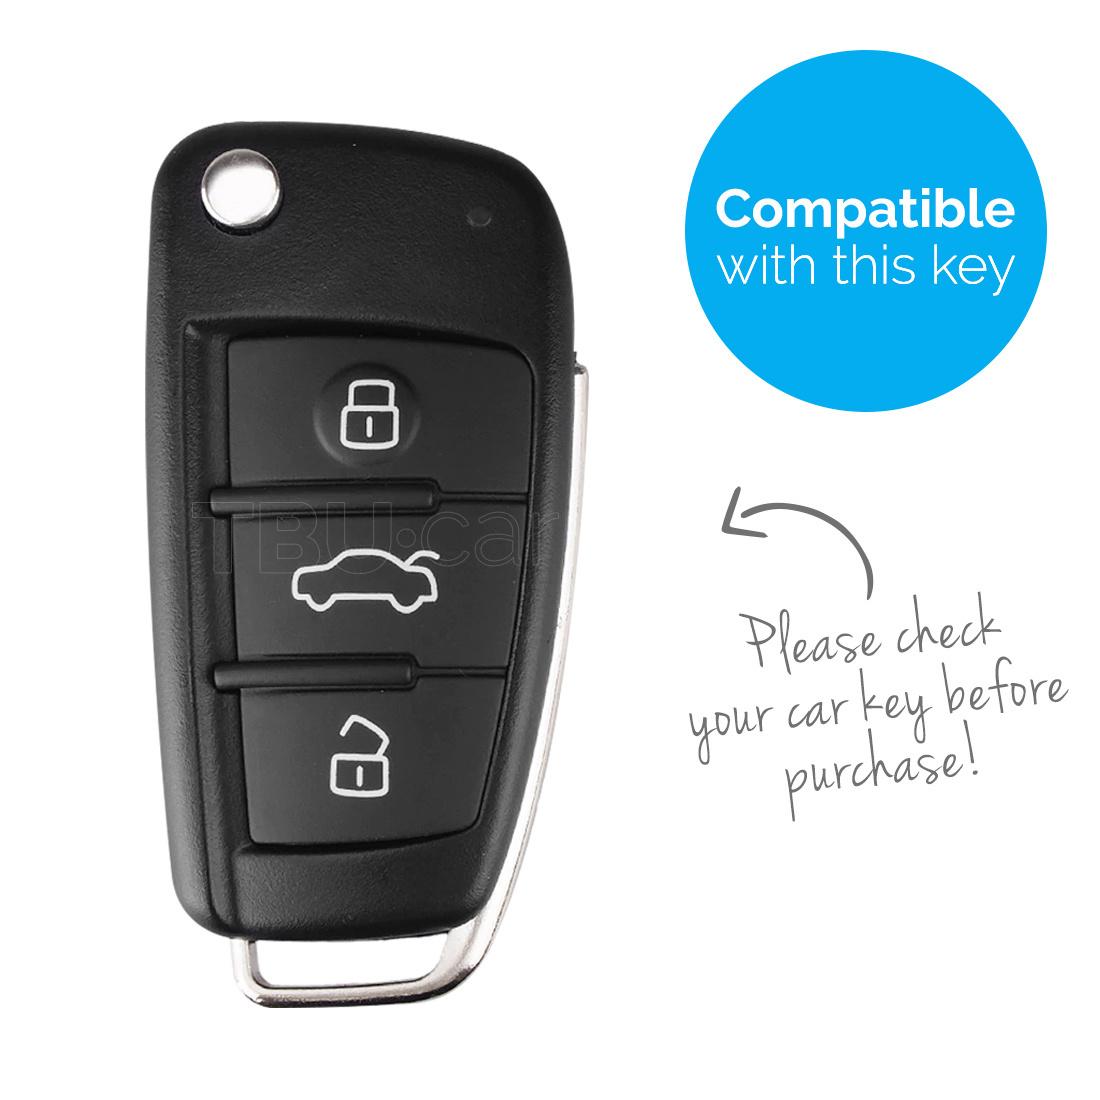 TBU car Autoschlüssel Hülle für Audi 3 Tasten - Schutzhülle aus Silikon - Auto Schlüsselhülle Cover in Rot